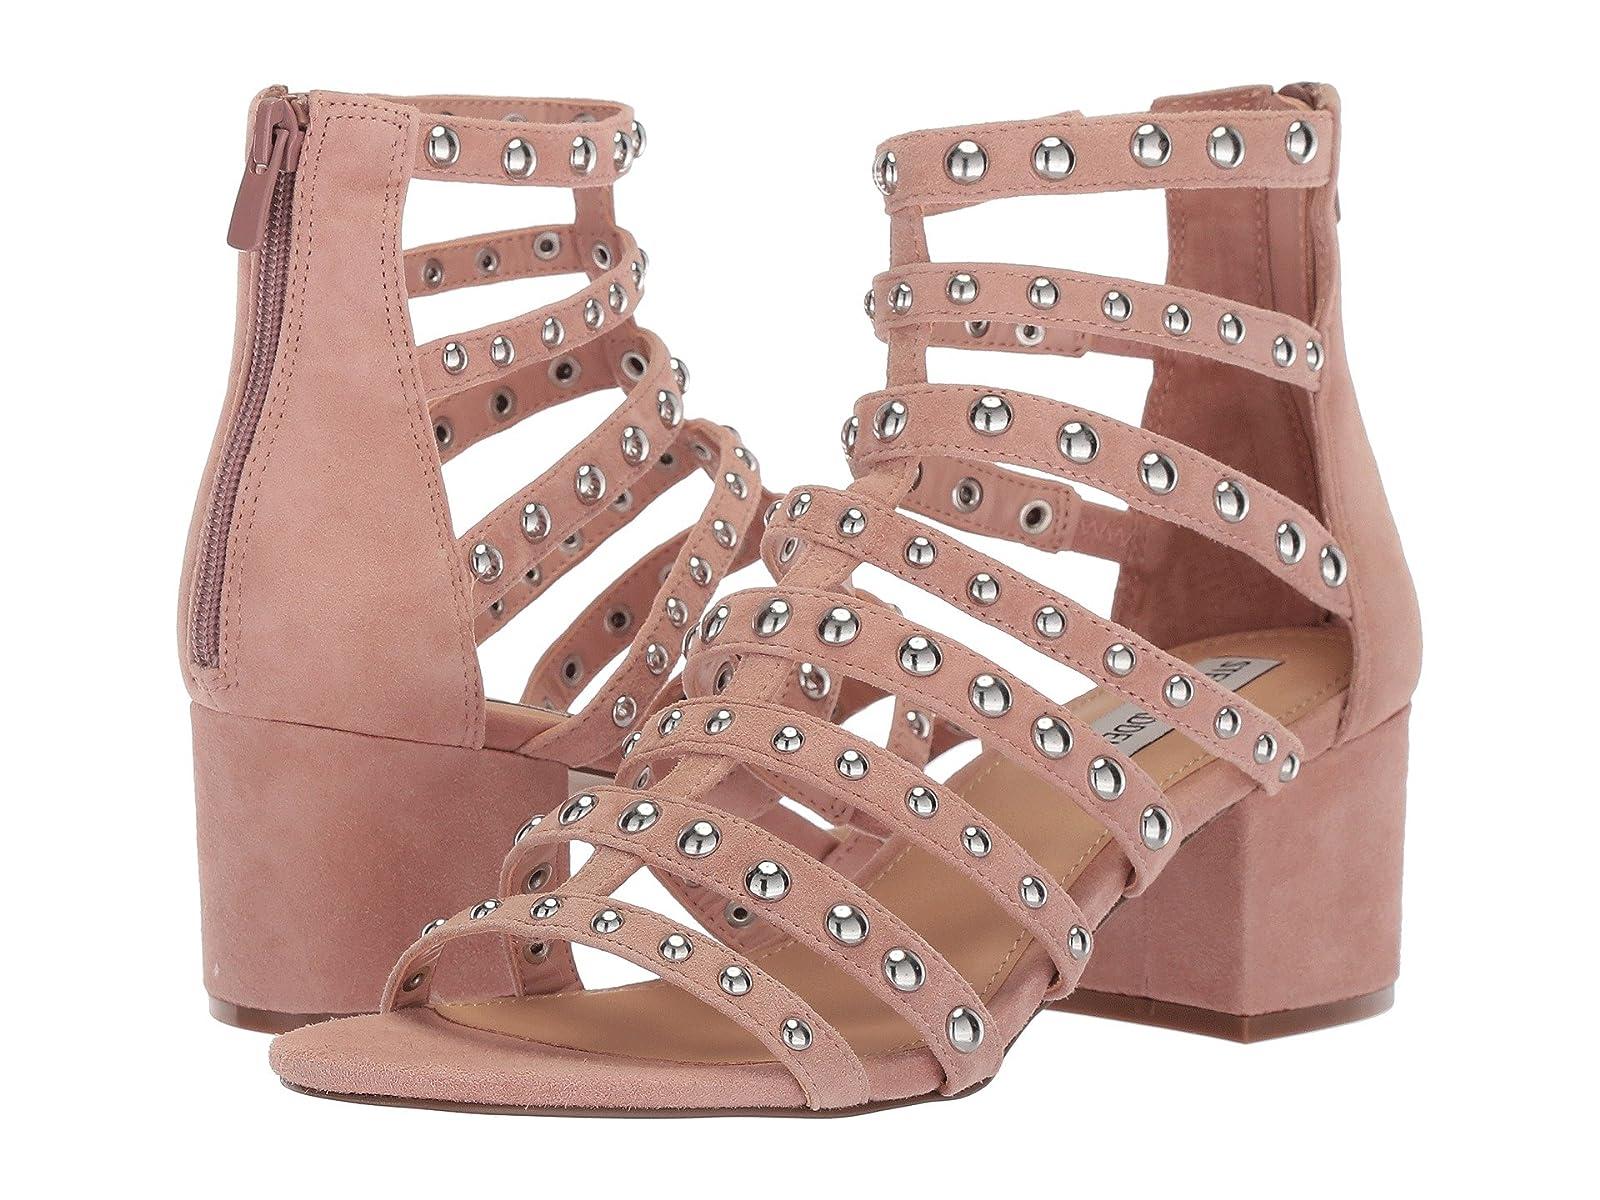 Steve Madden Mania Block Heeled SandalCheap and distinctive eye-catching shoes